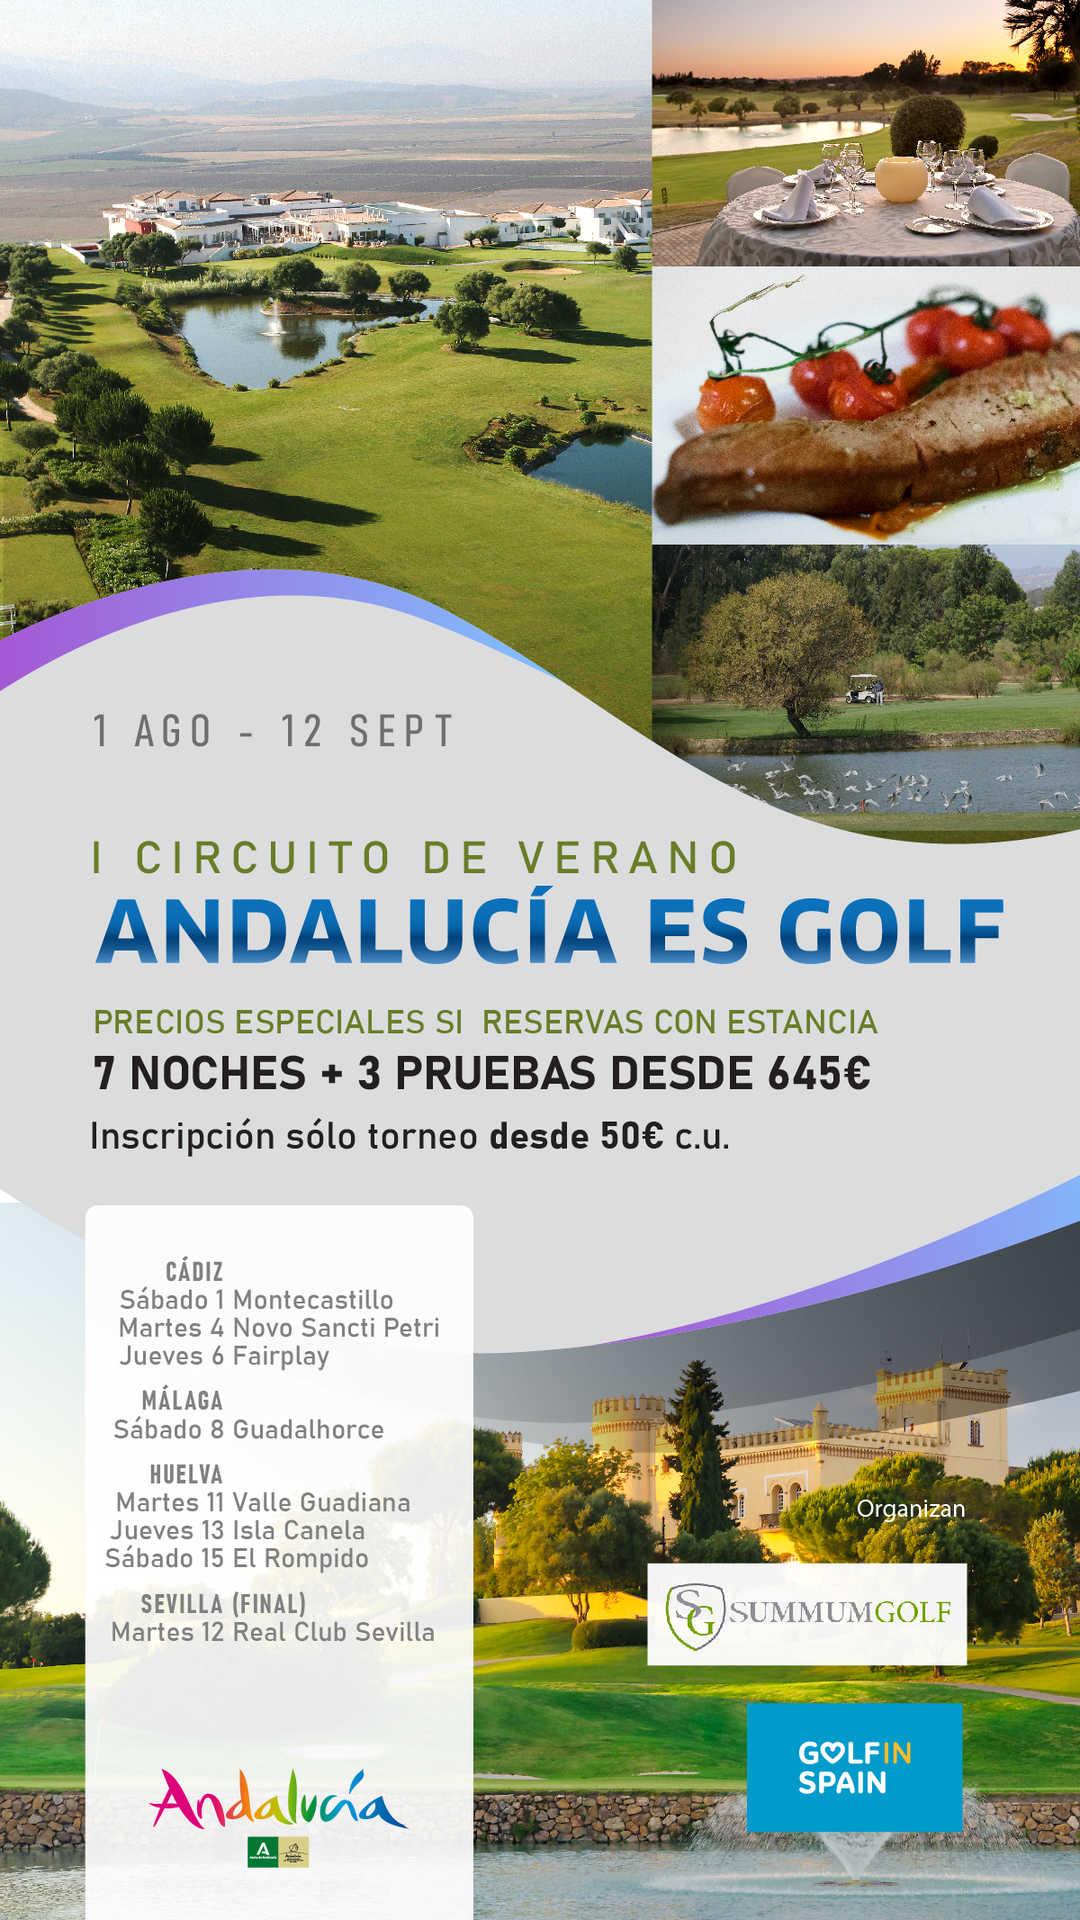 I Circuito de Verano Andalucía es Golf